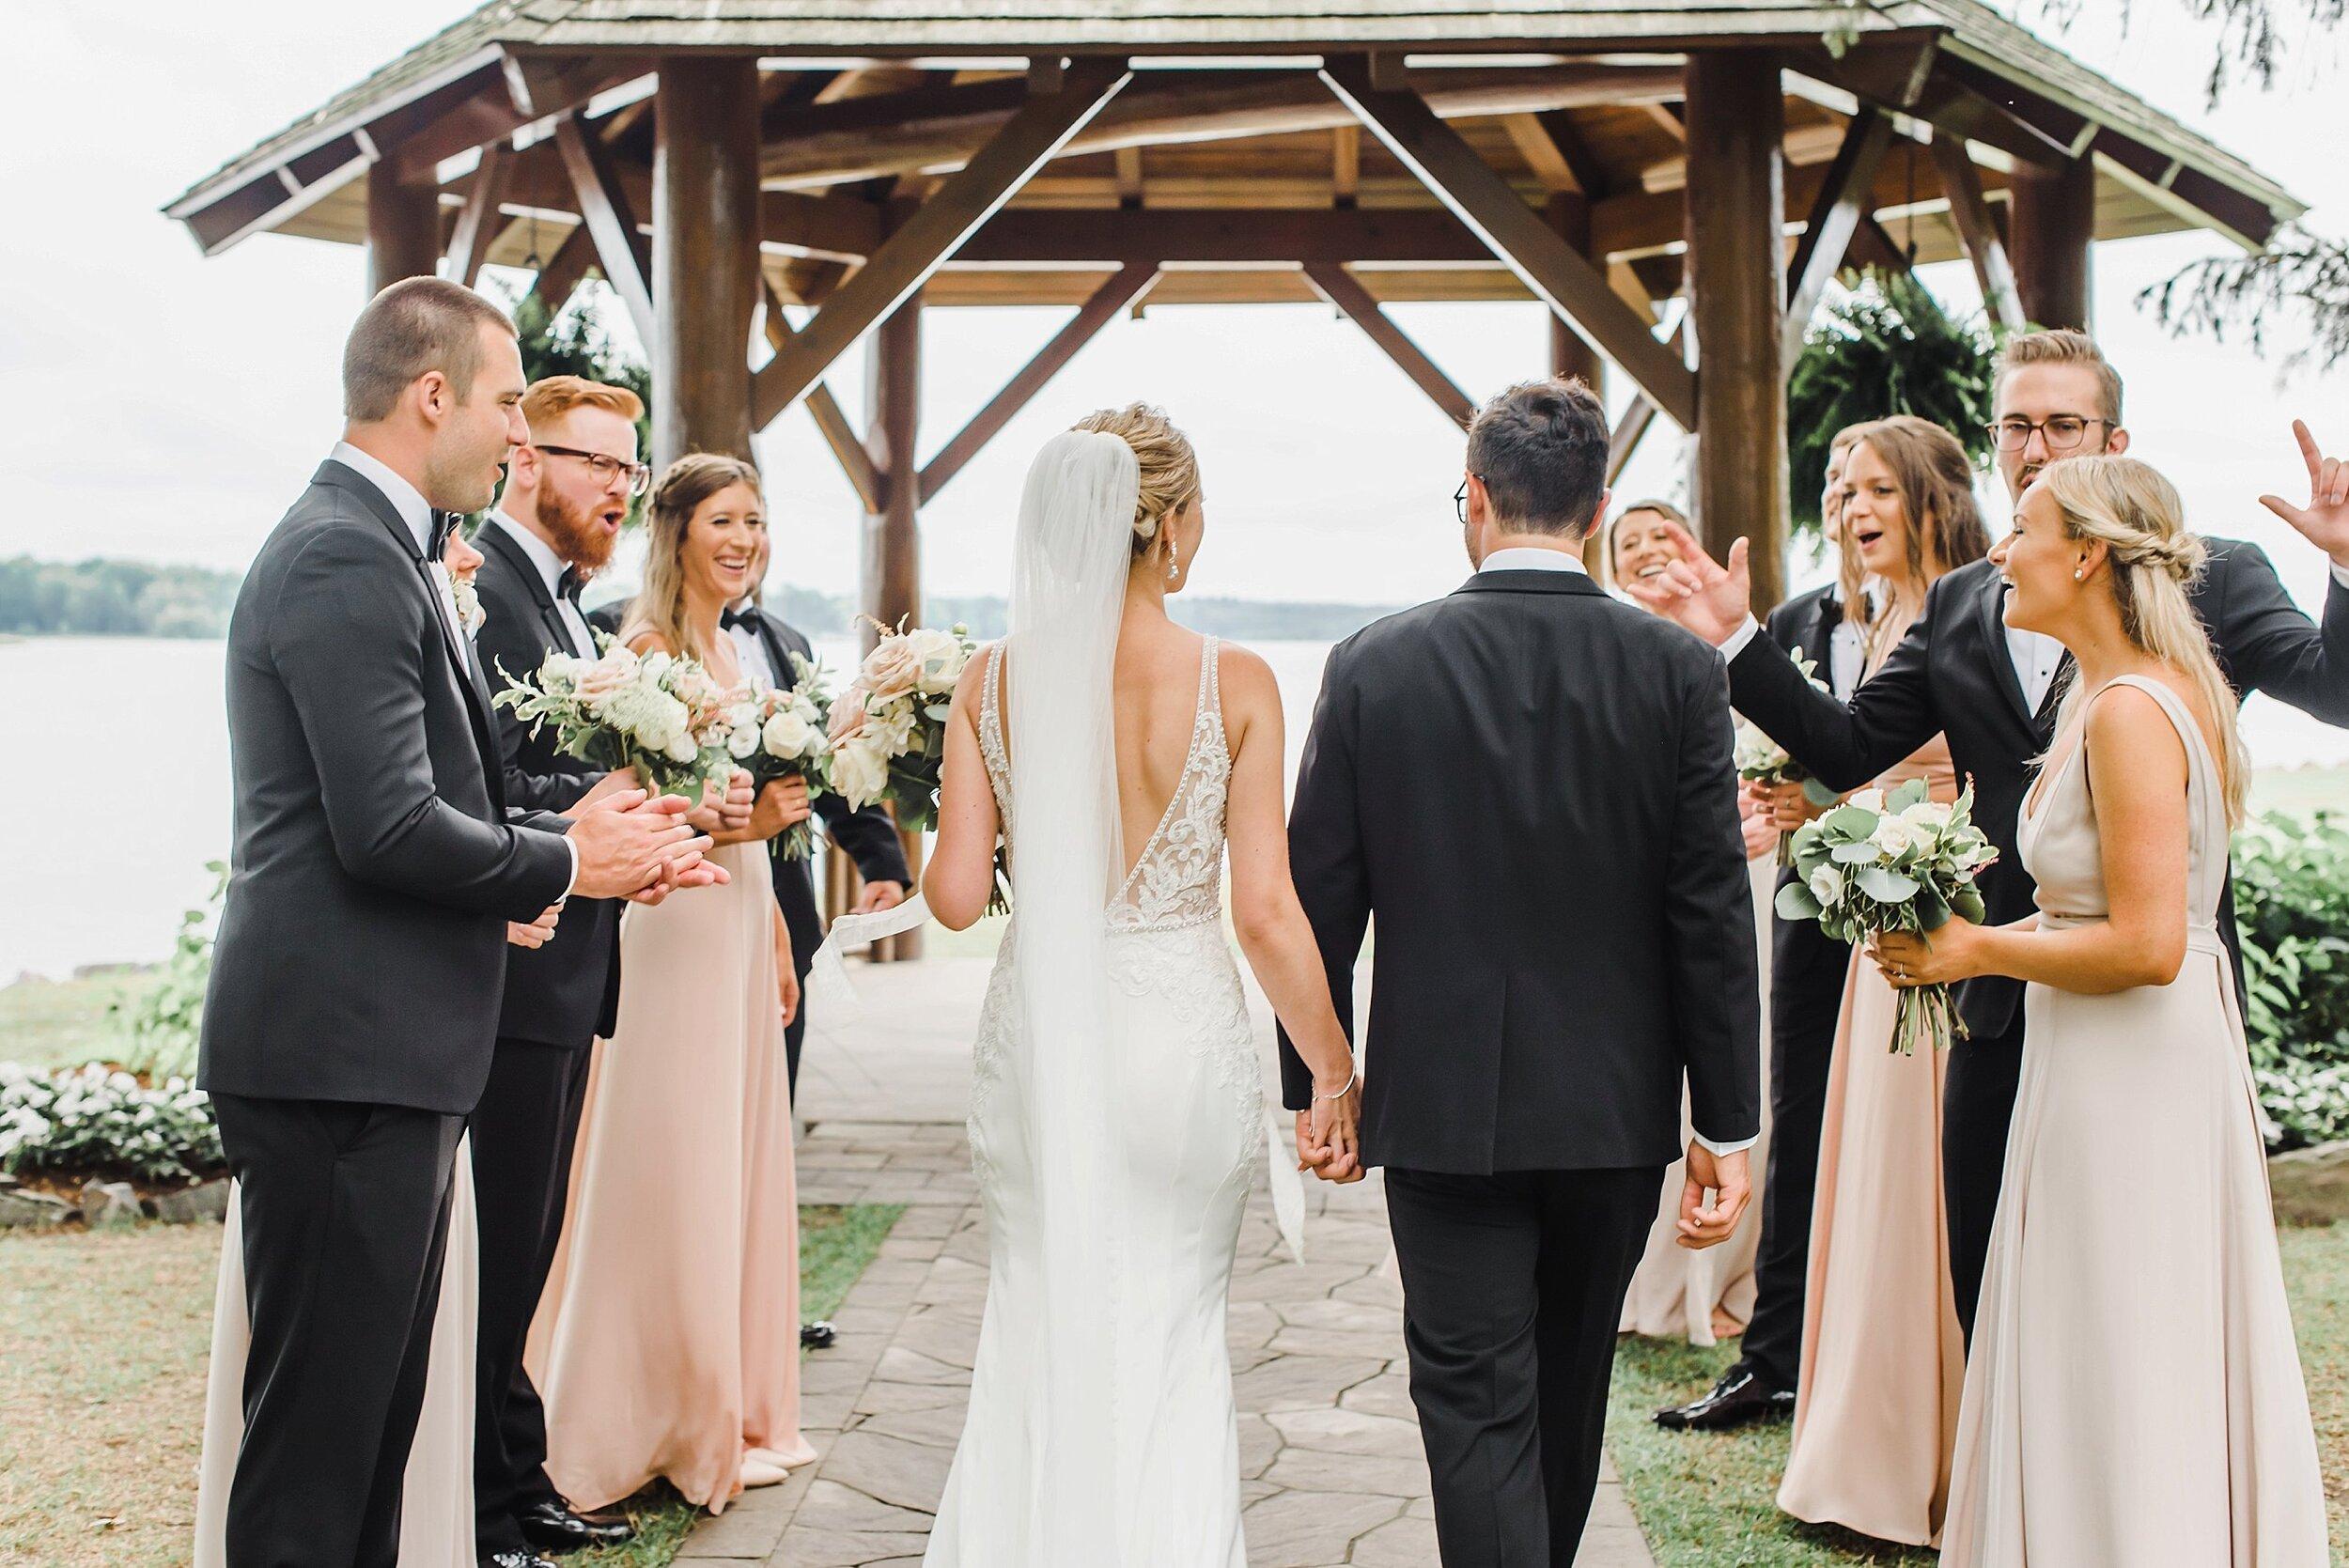 light airy fine art ottawa wedding photographer | Ali and Batoul Photography | Fairmont Le Chateau Montebello42.jpg